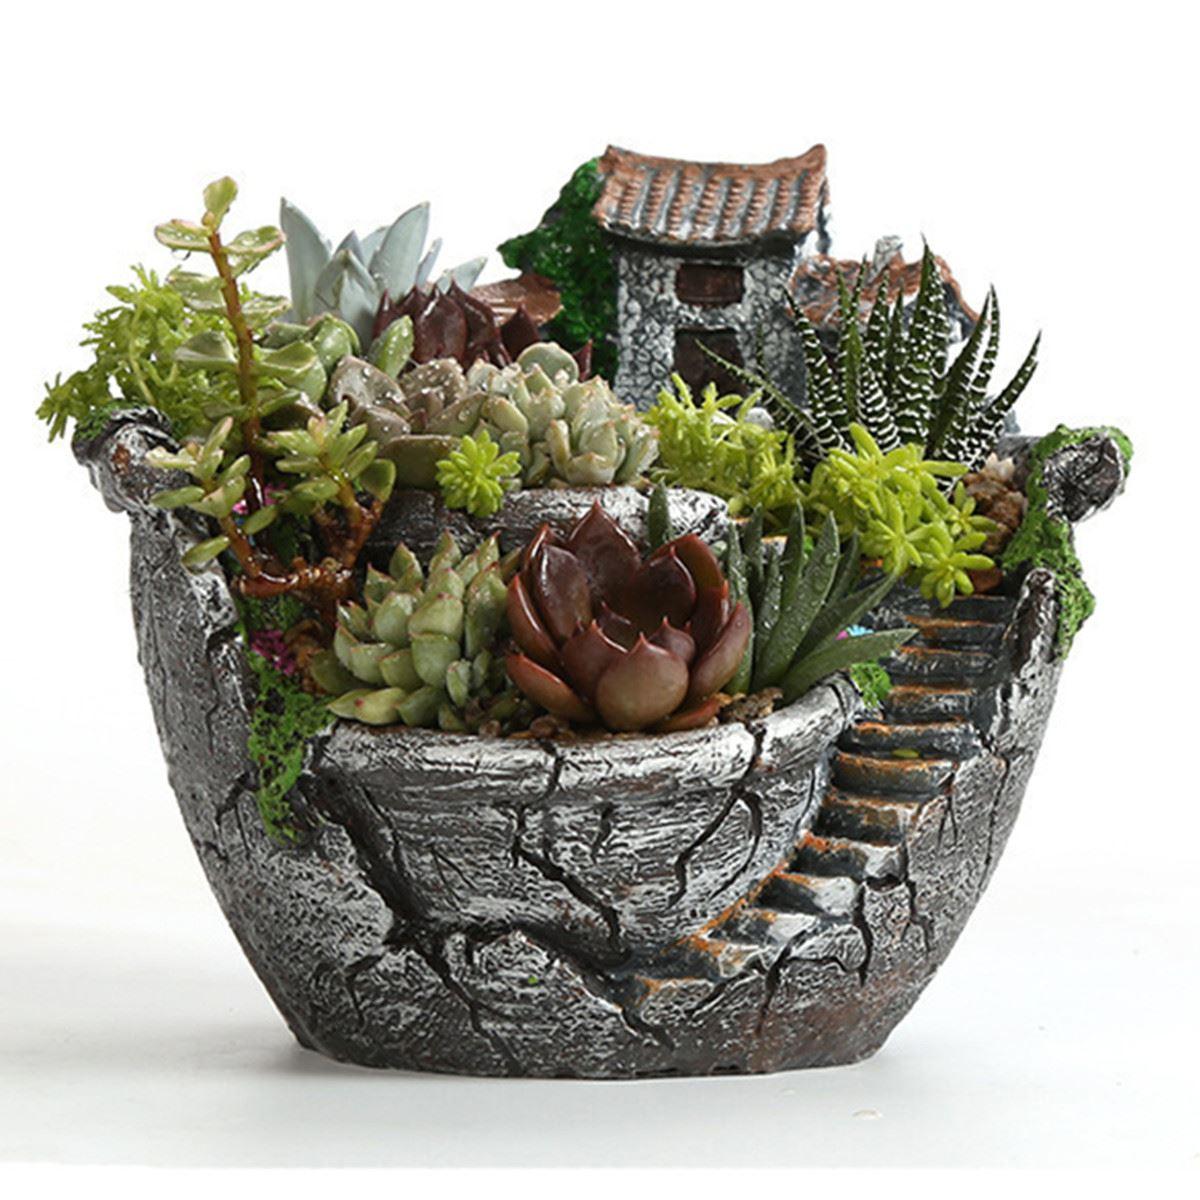 resin garden cactus succulent plant pot herb flower planter box nursery pots home room decor. Black Bedroom Furniture Sets. Home Design Ideas